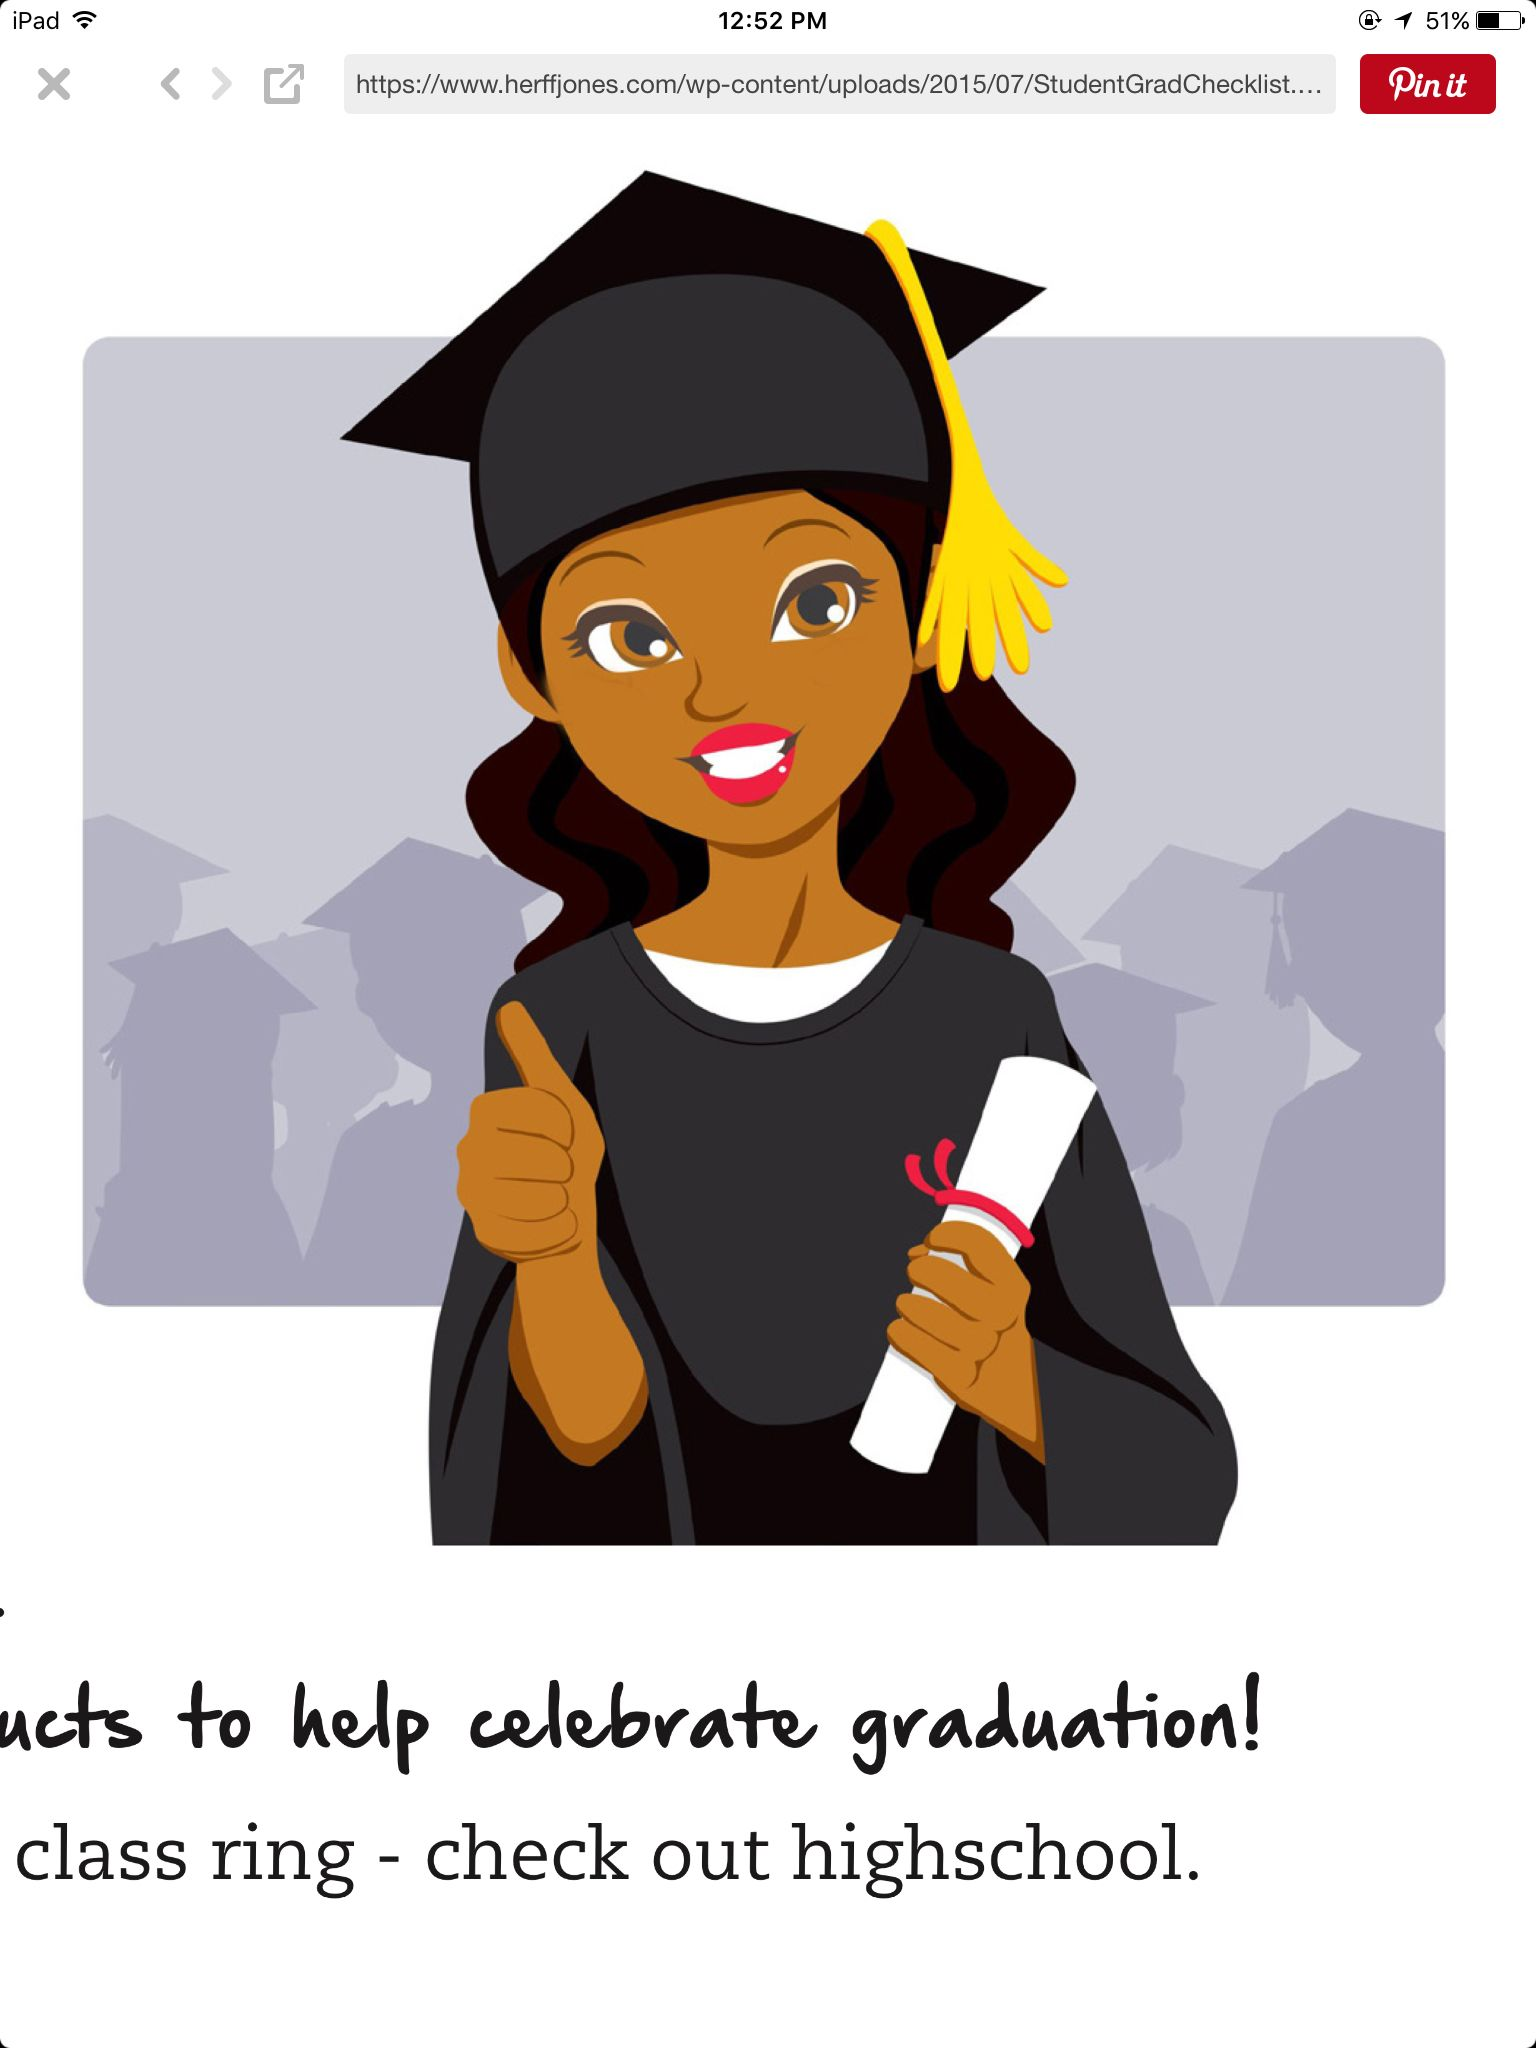 Senior Year Graduation Checklist S Herffjones